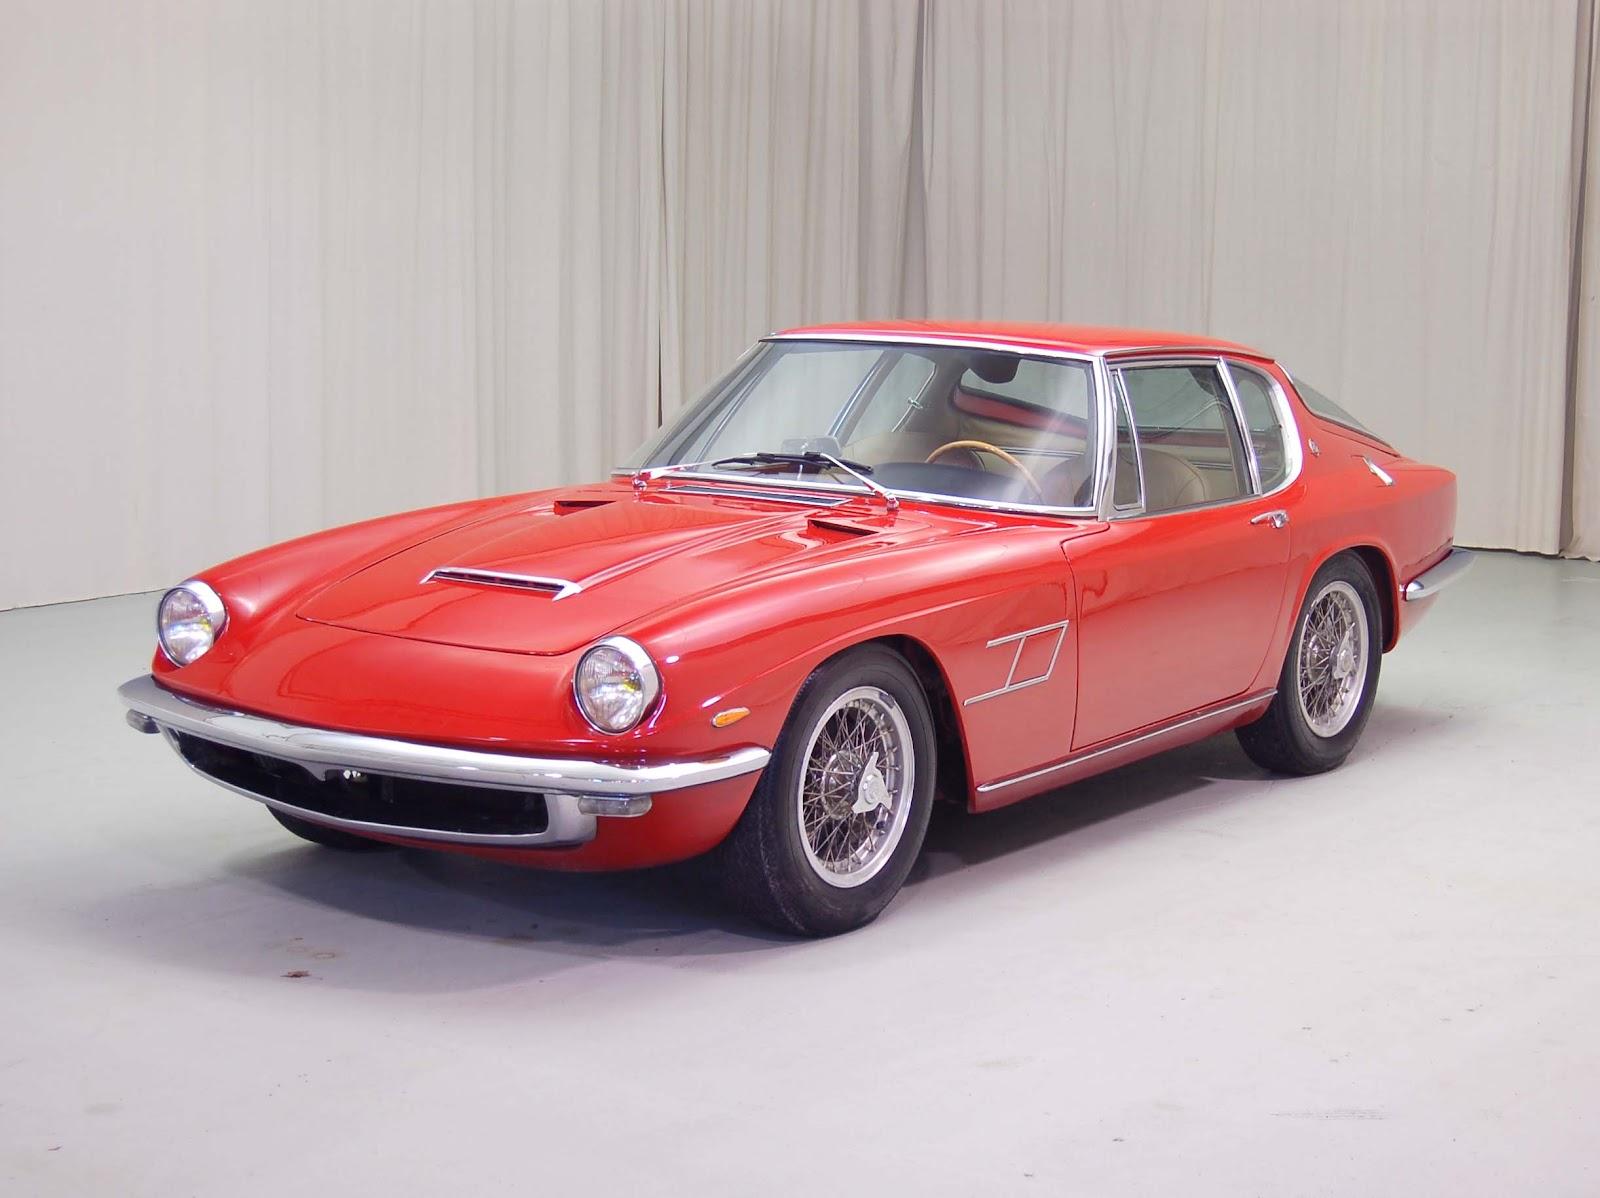 Maserati Mistral on Talbot Lago Cars